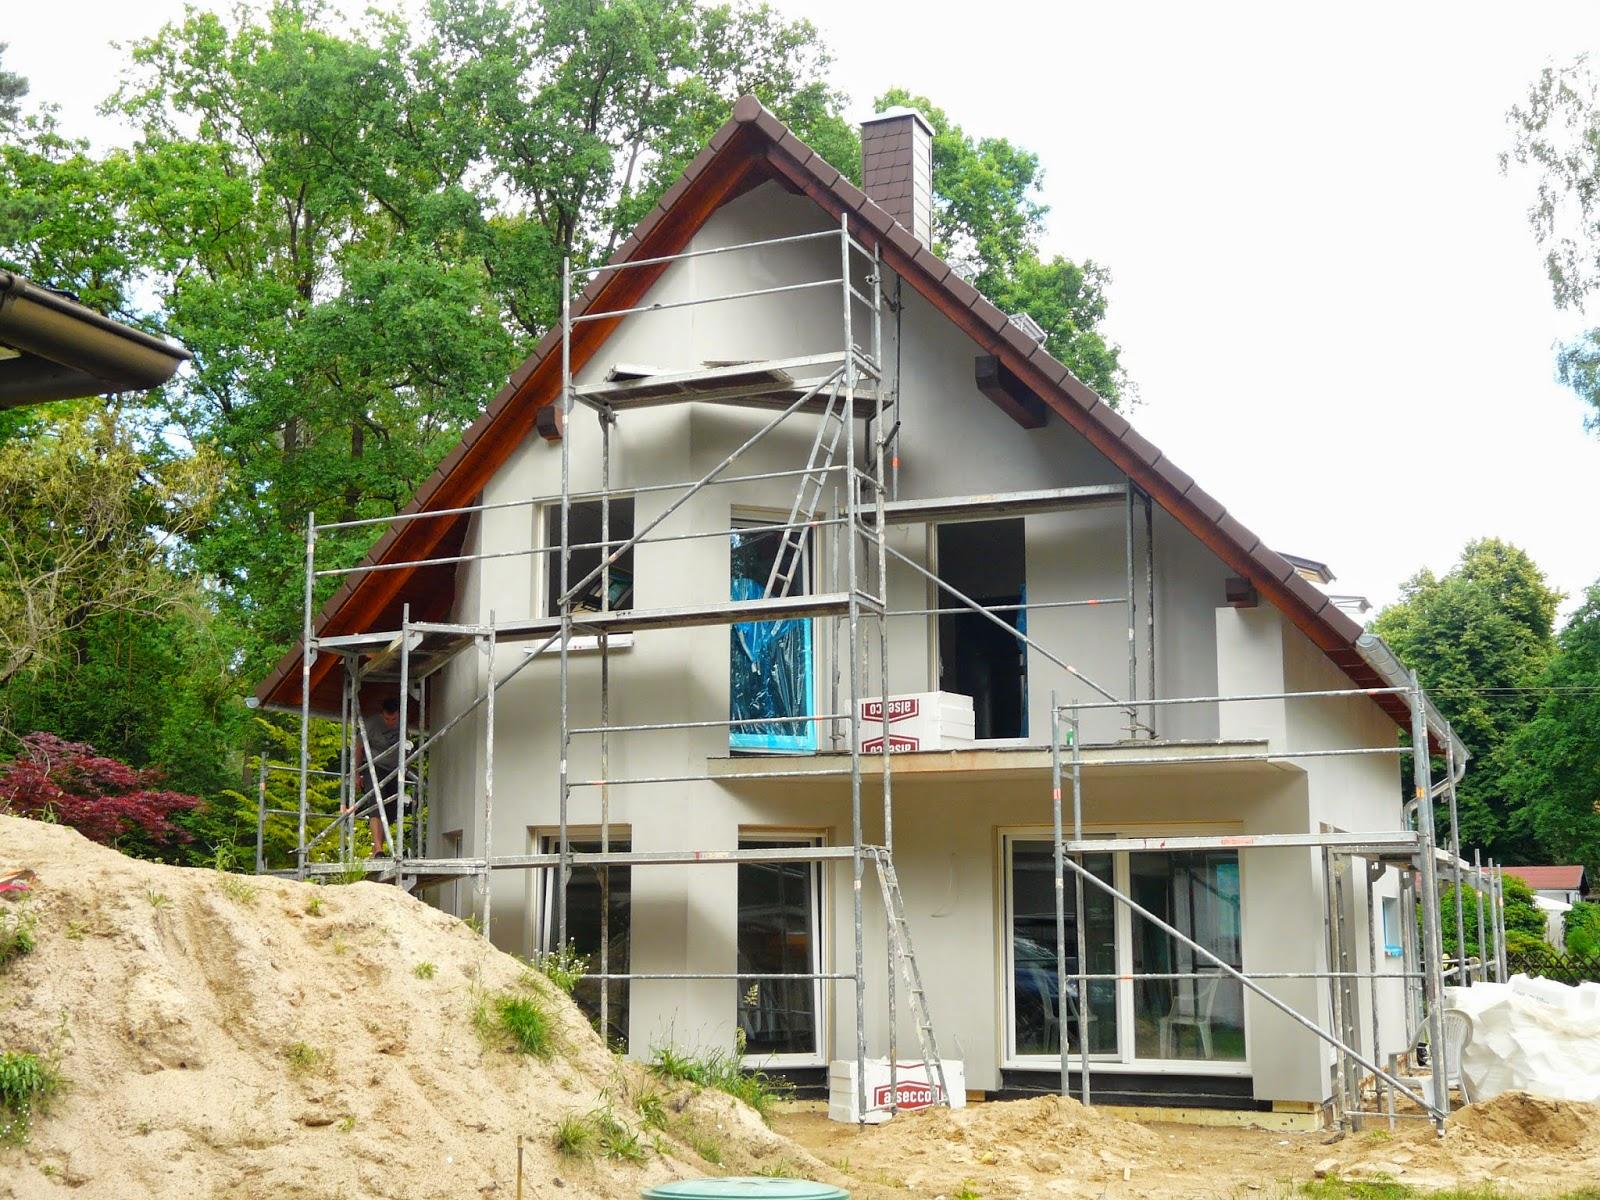 FIBAV HAUS HS BAU Bautagebuch 16 06 14 Das Haus ist